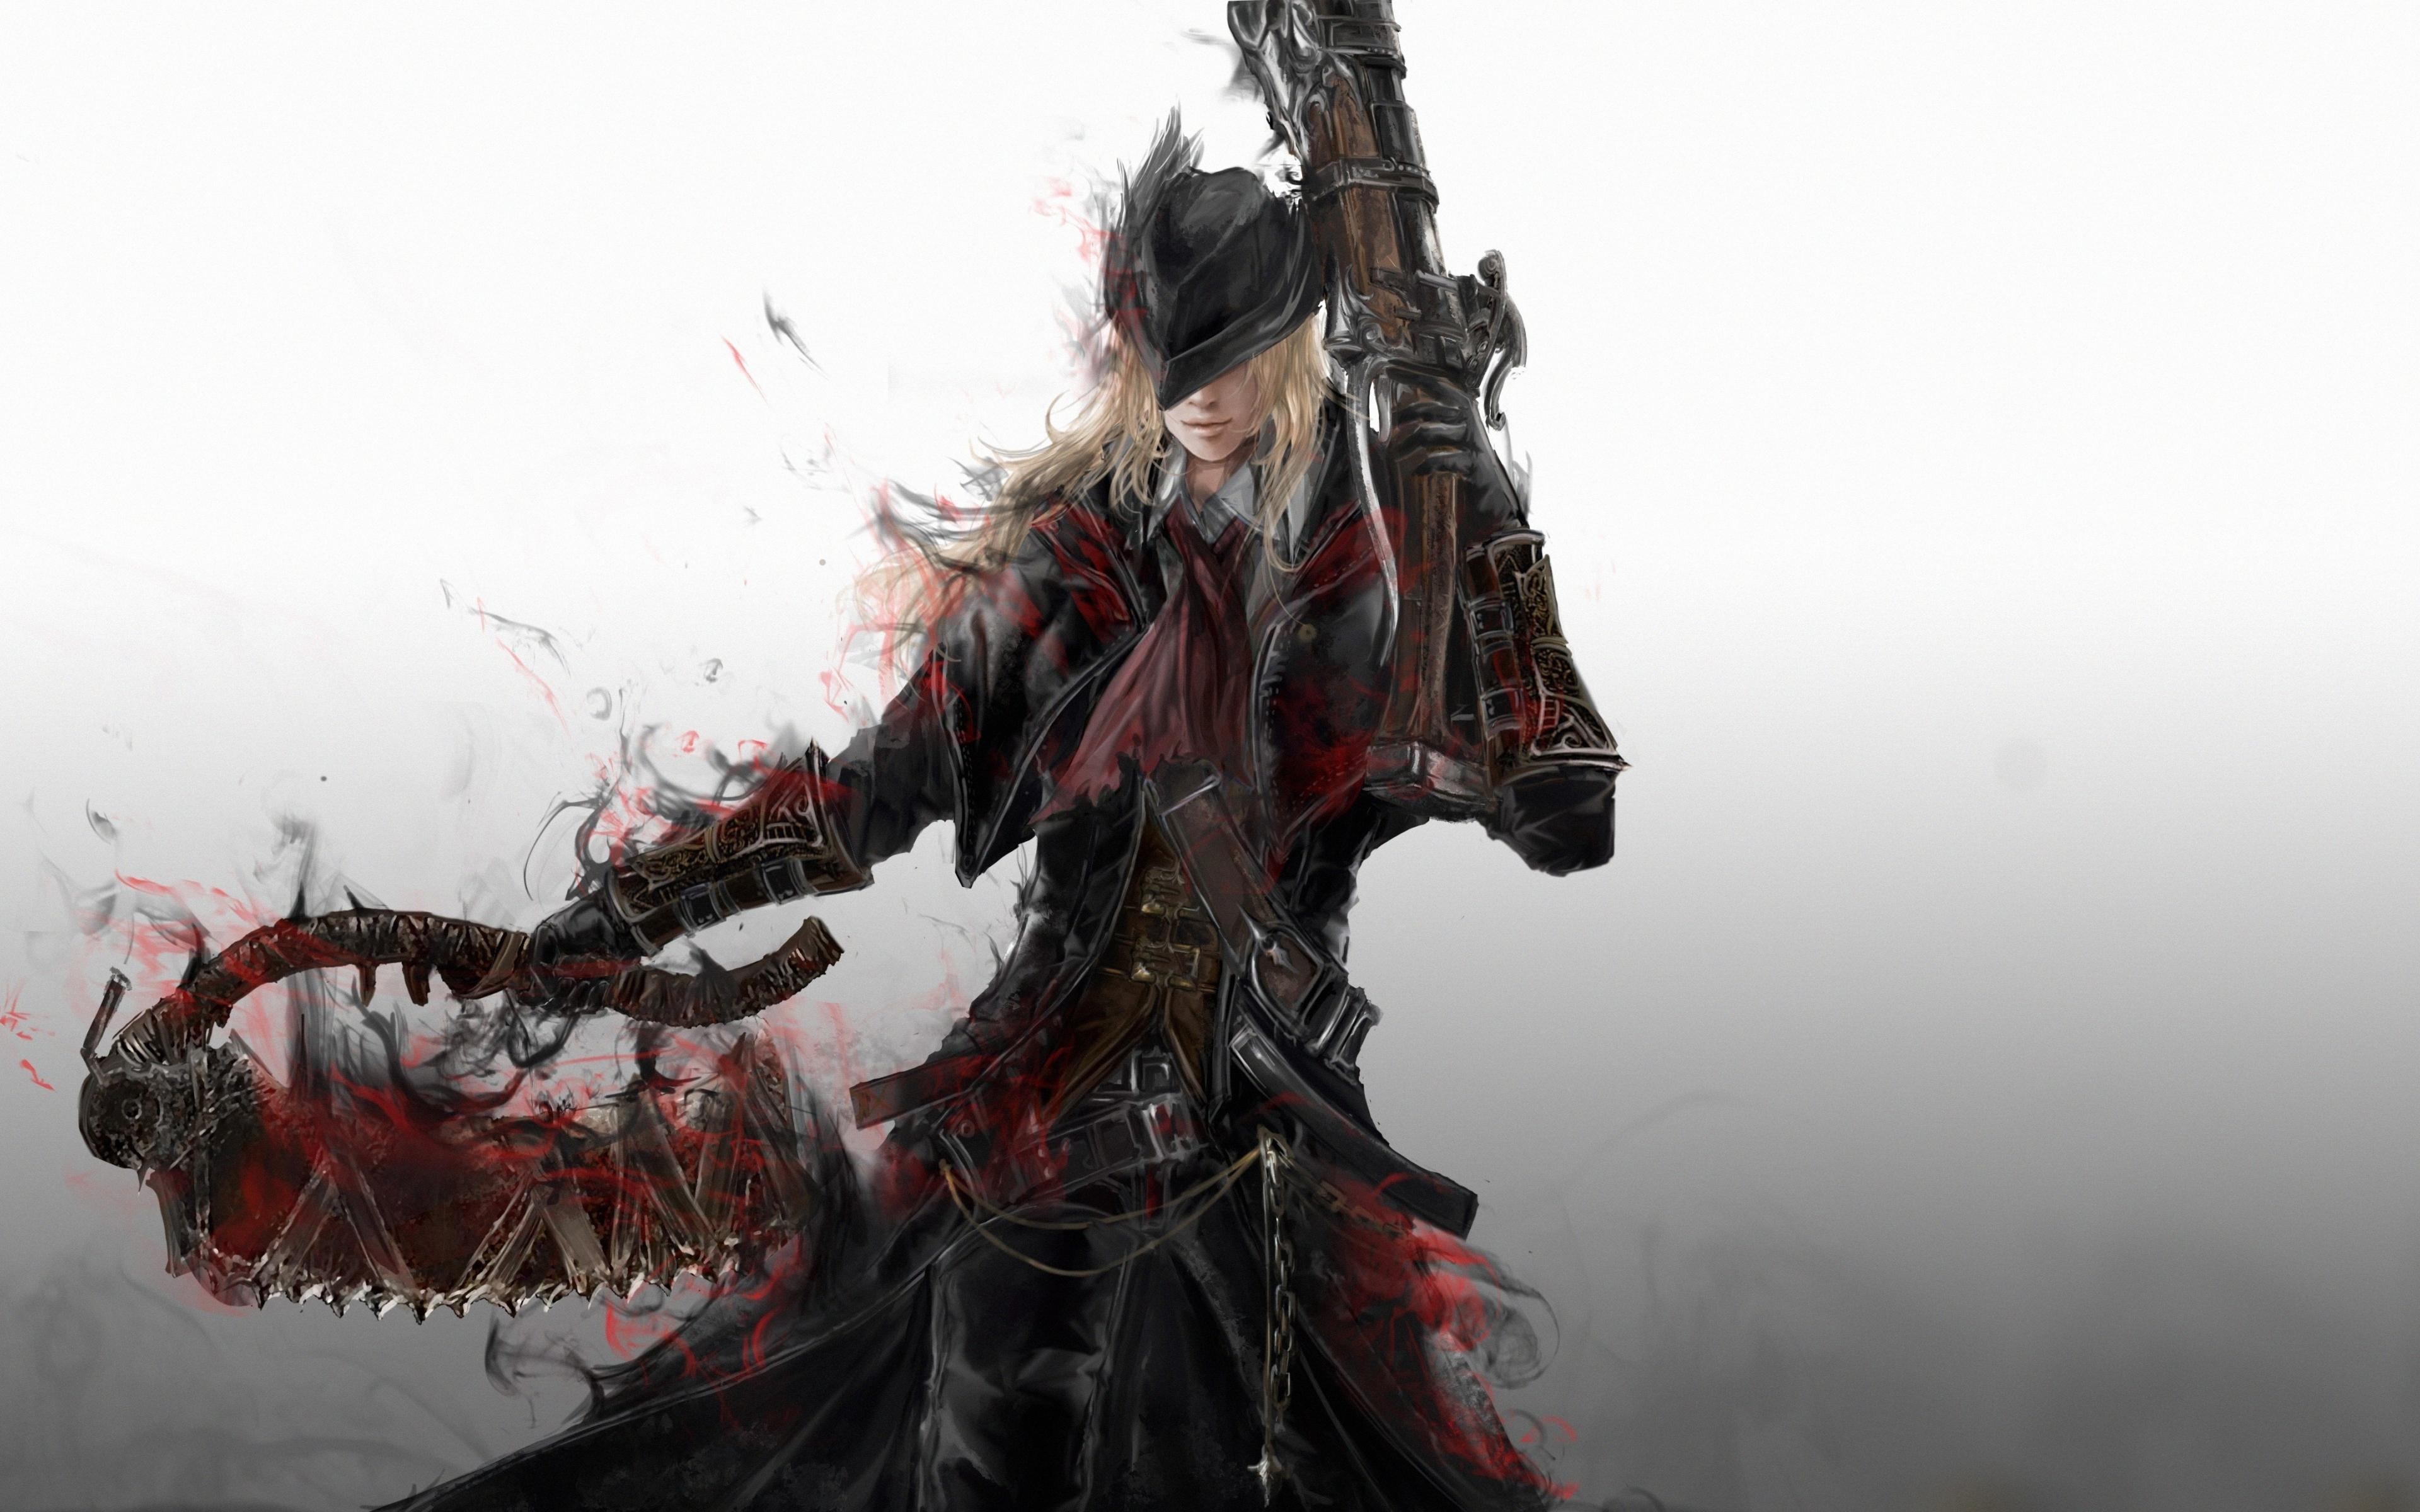 Download 3840x2400 Wallpaper Video Game, Warrior